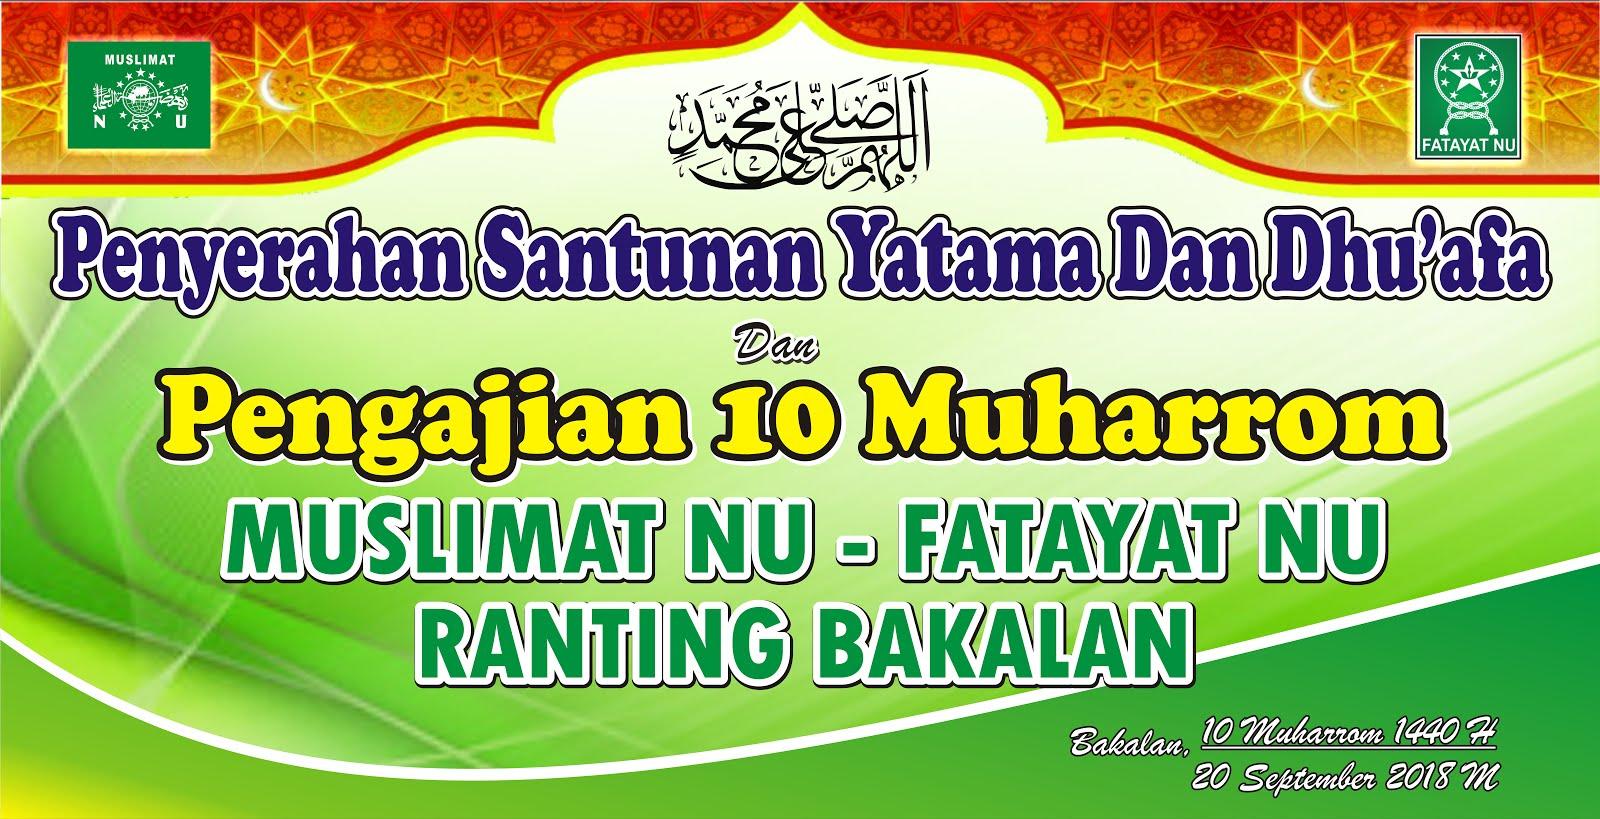 Berikut Contoh Banner Pamflet Untuk Acara Pengajian Muharram Santunan Yatim Piatu